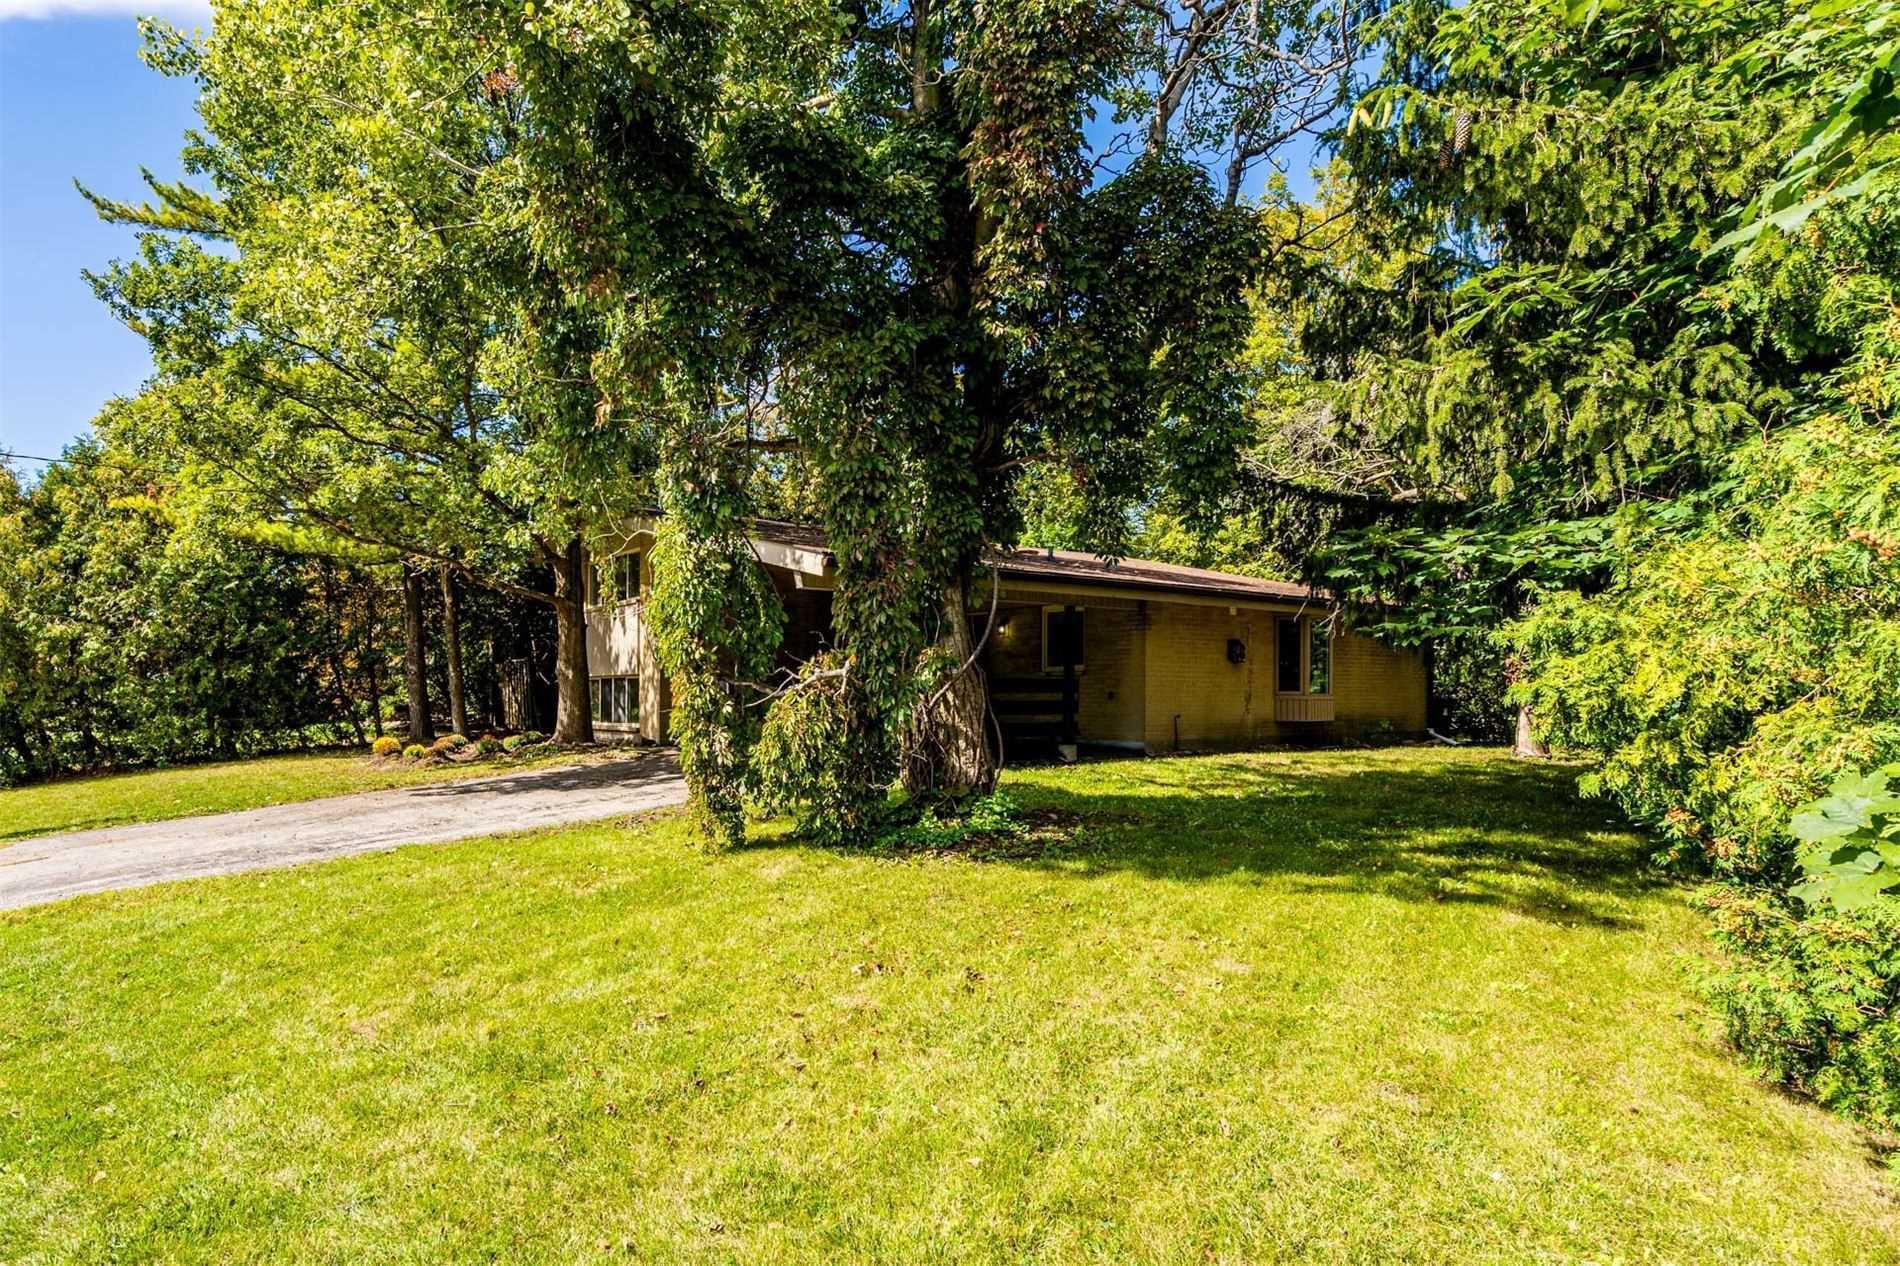 140 Verobeach Blvd - Humbermede Detached for sale, 3 Bedrooms (W5385046) - #30